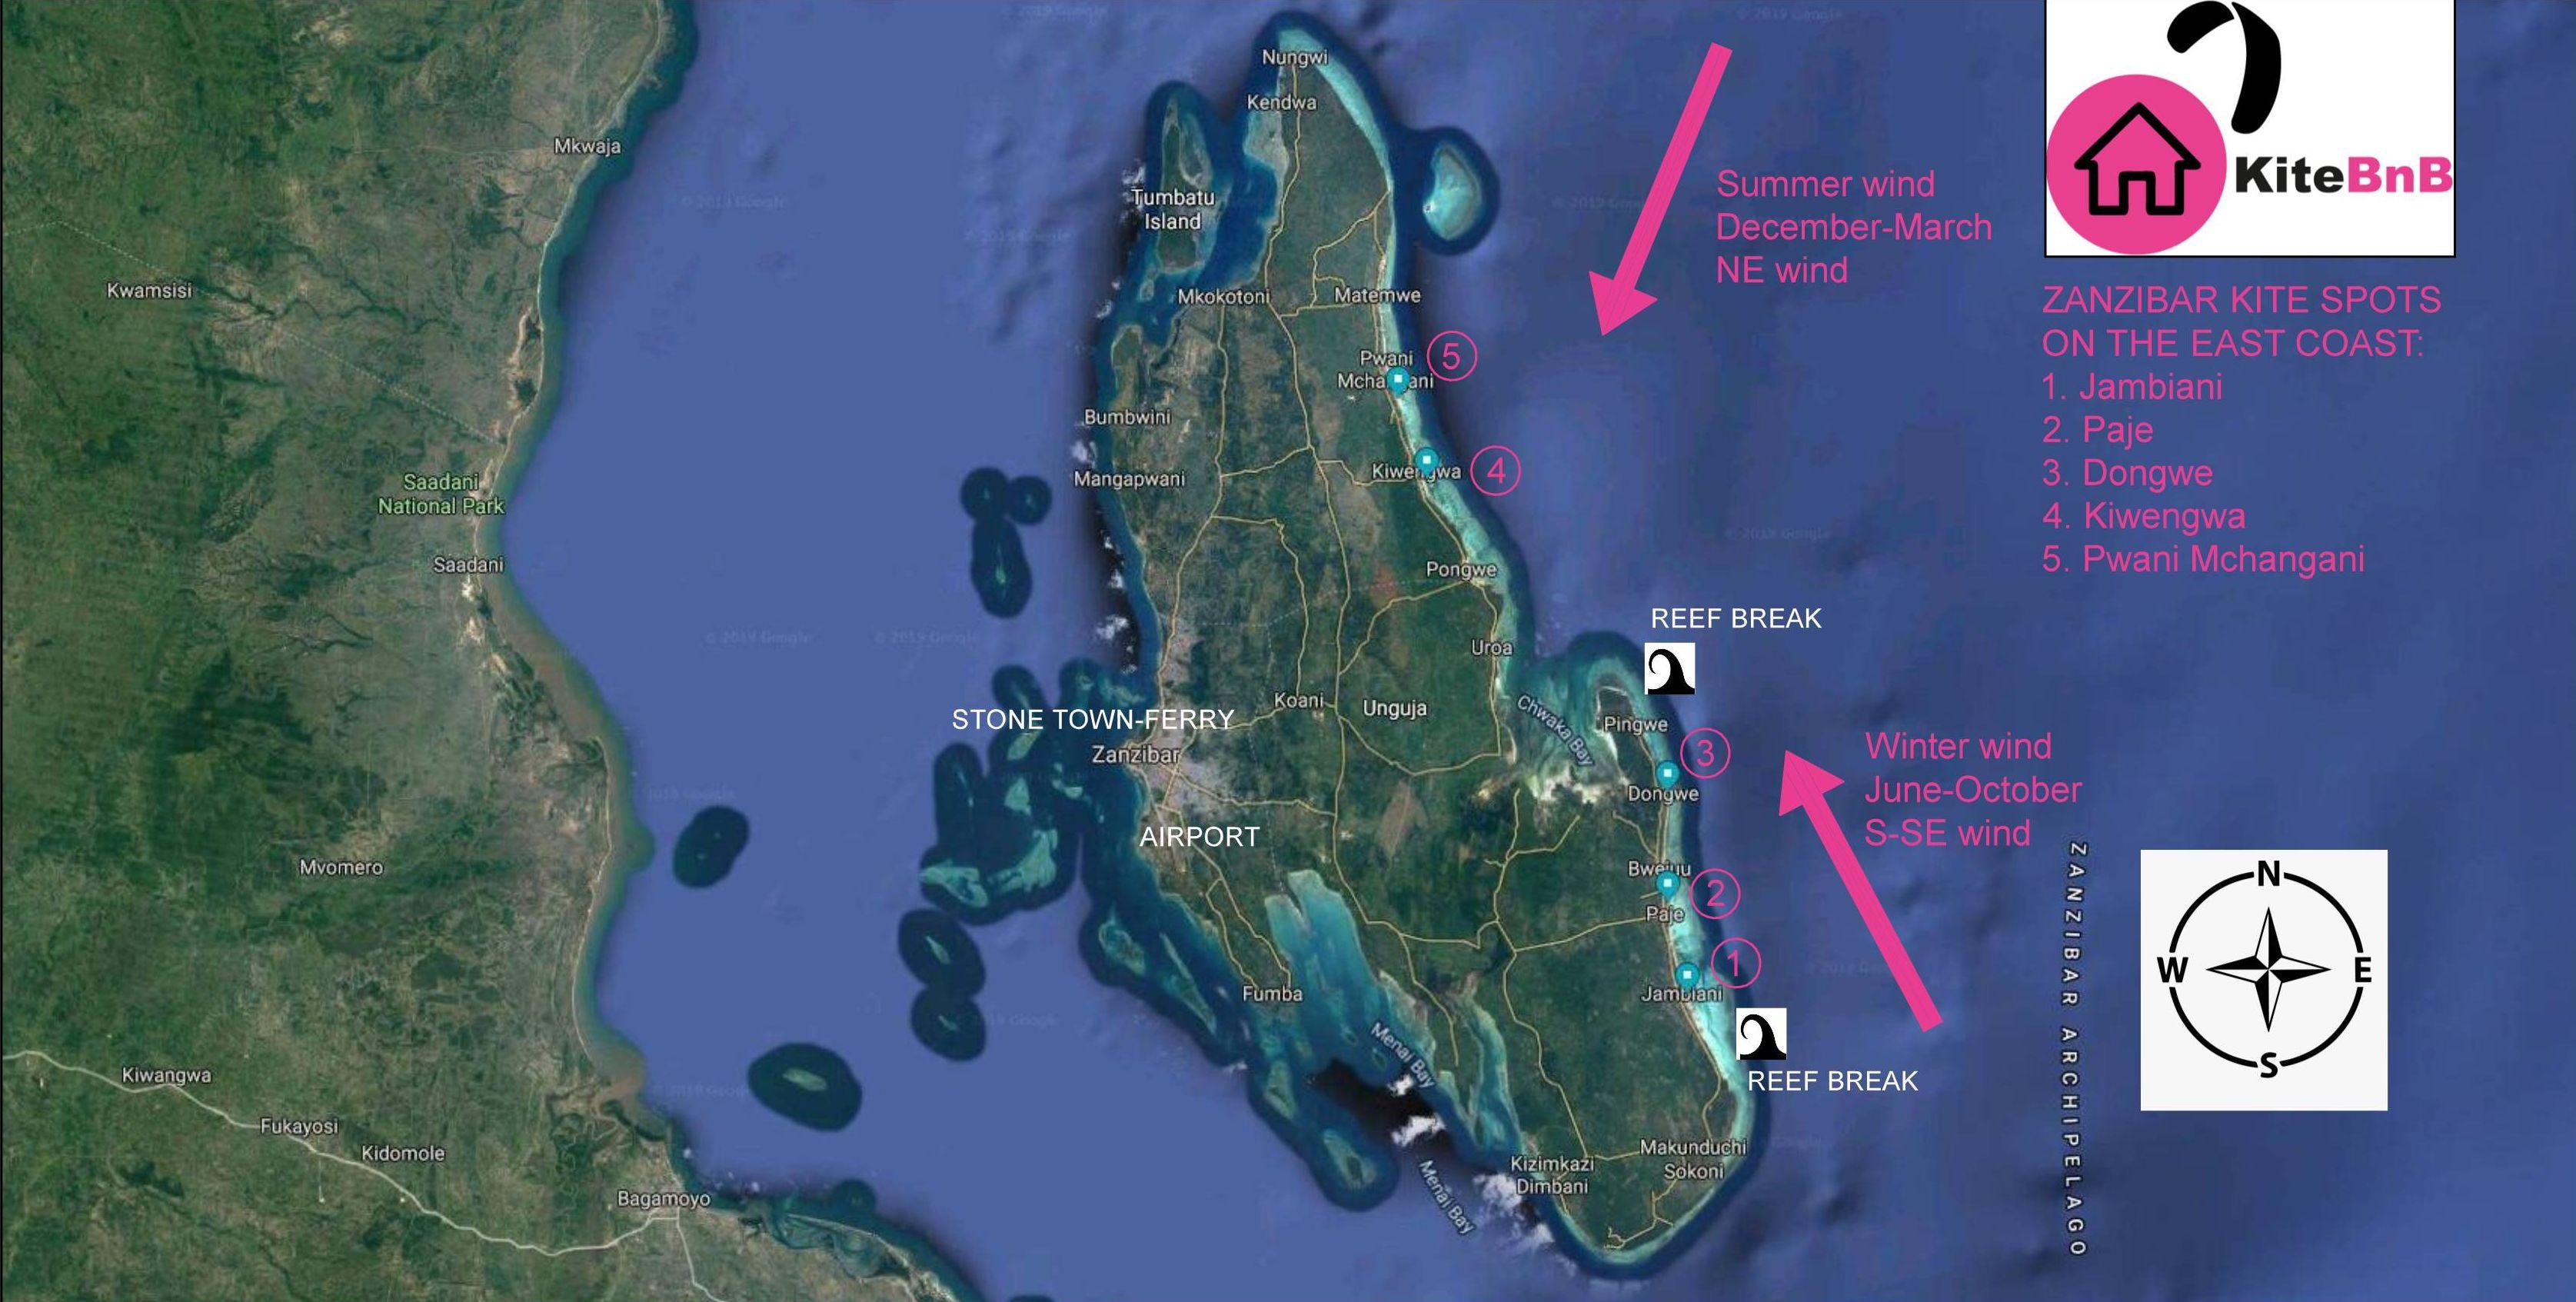 Zanzibar kitesurfing spots map